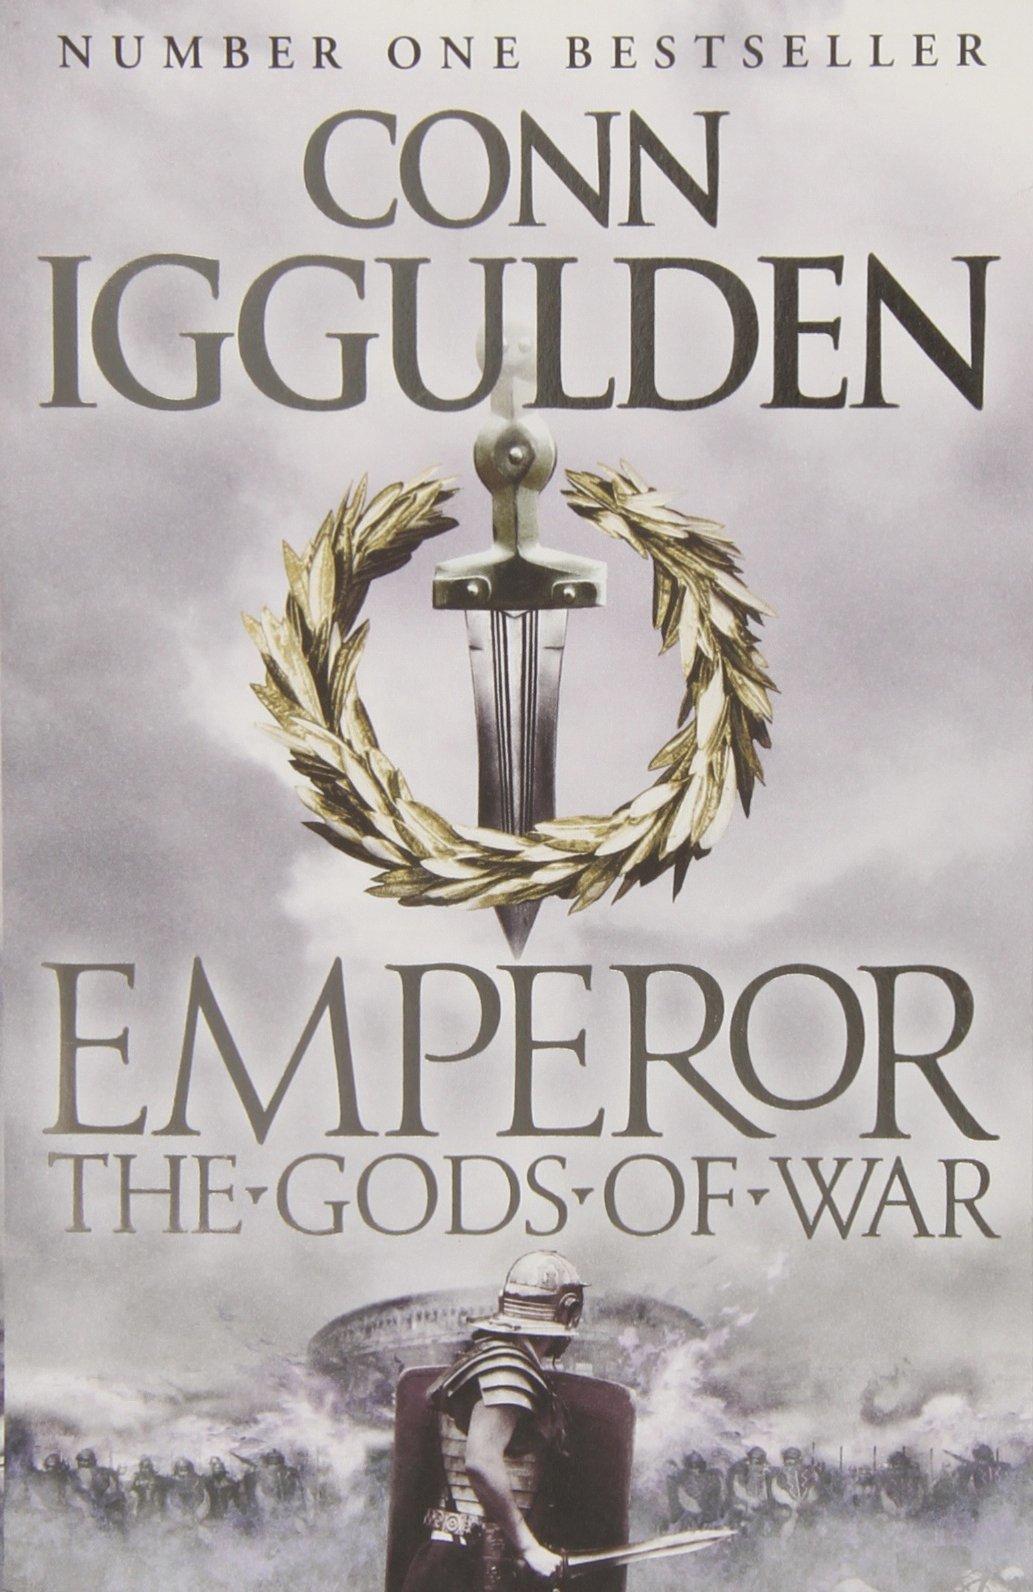 The Gods of War by Conn Iggulden image